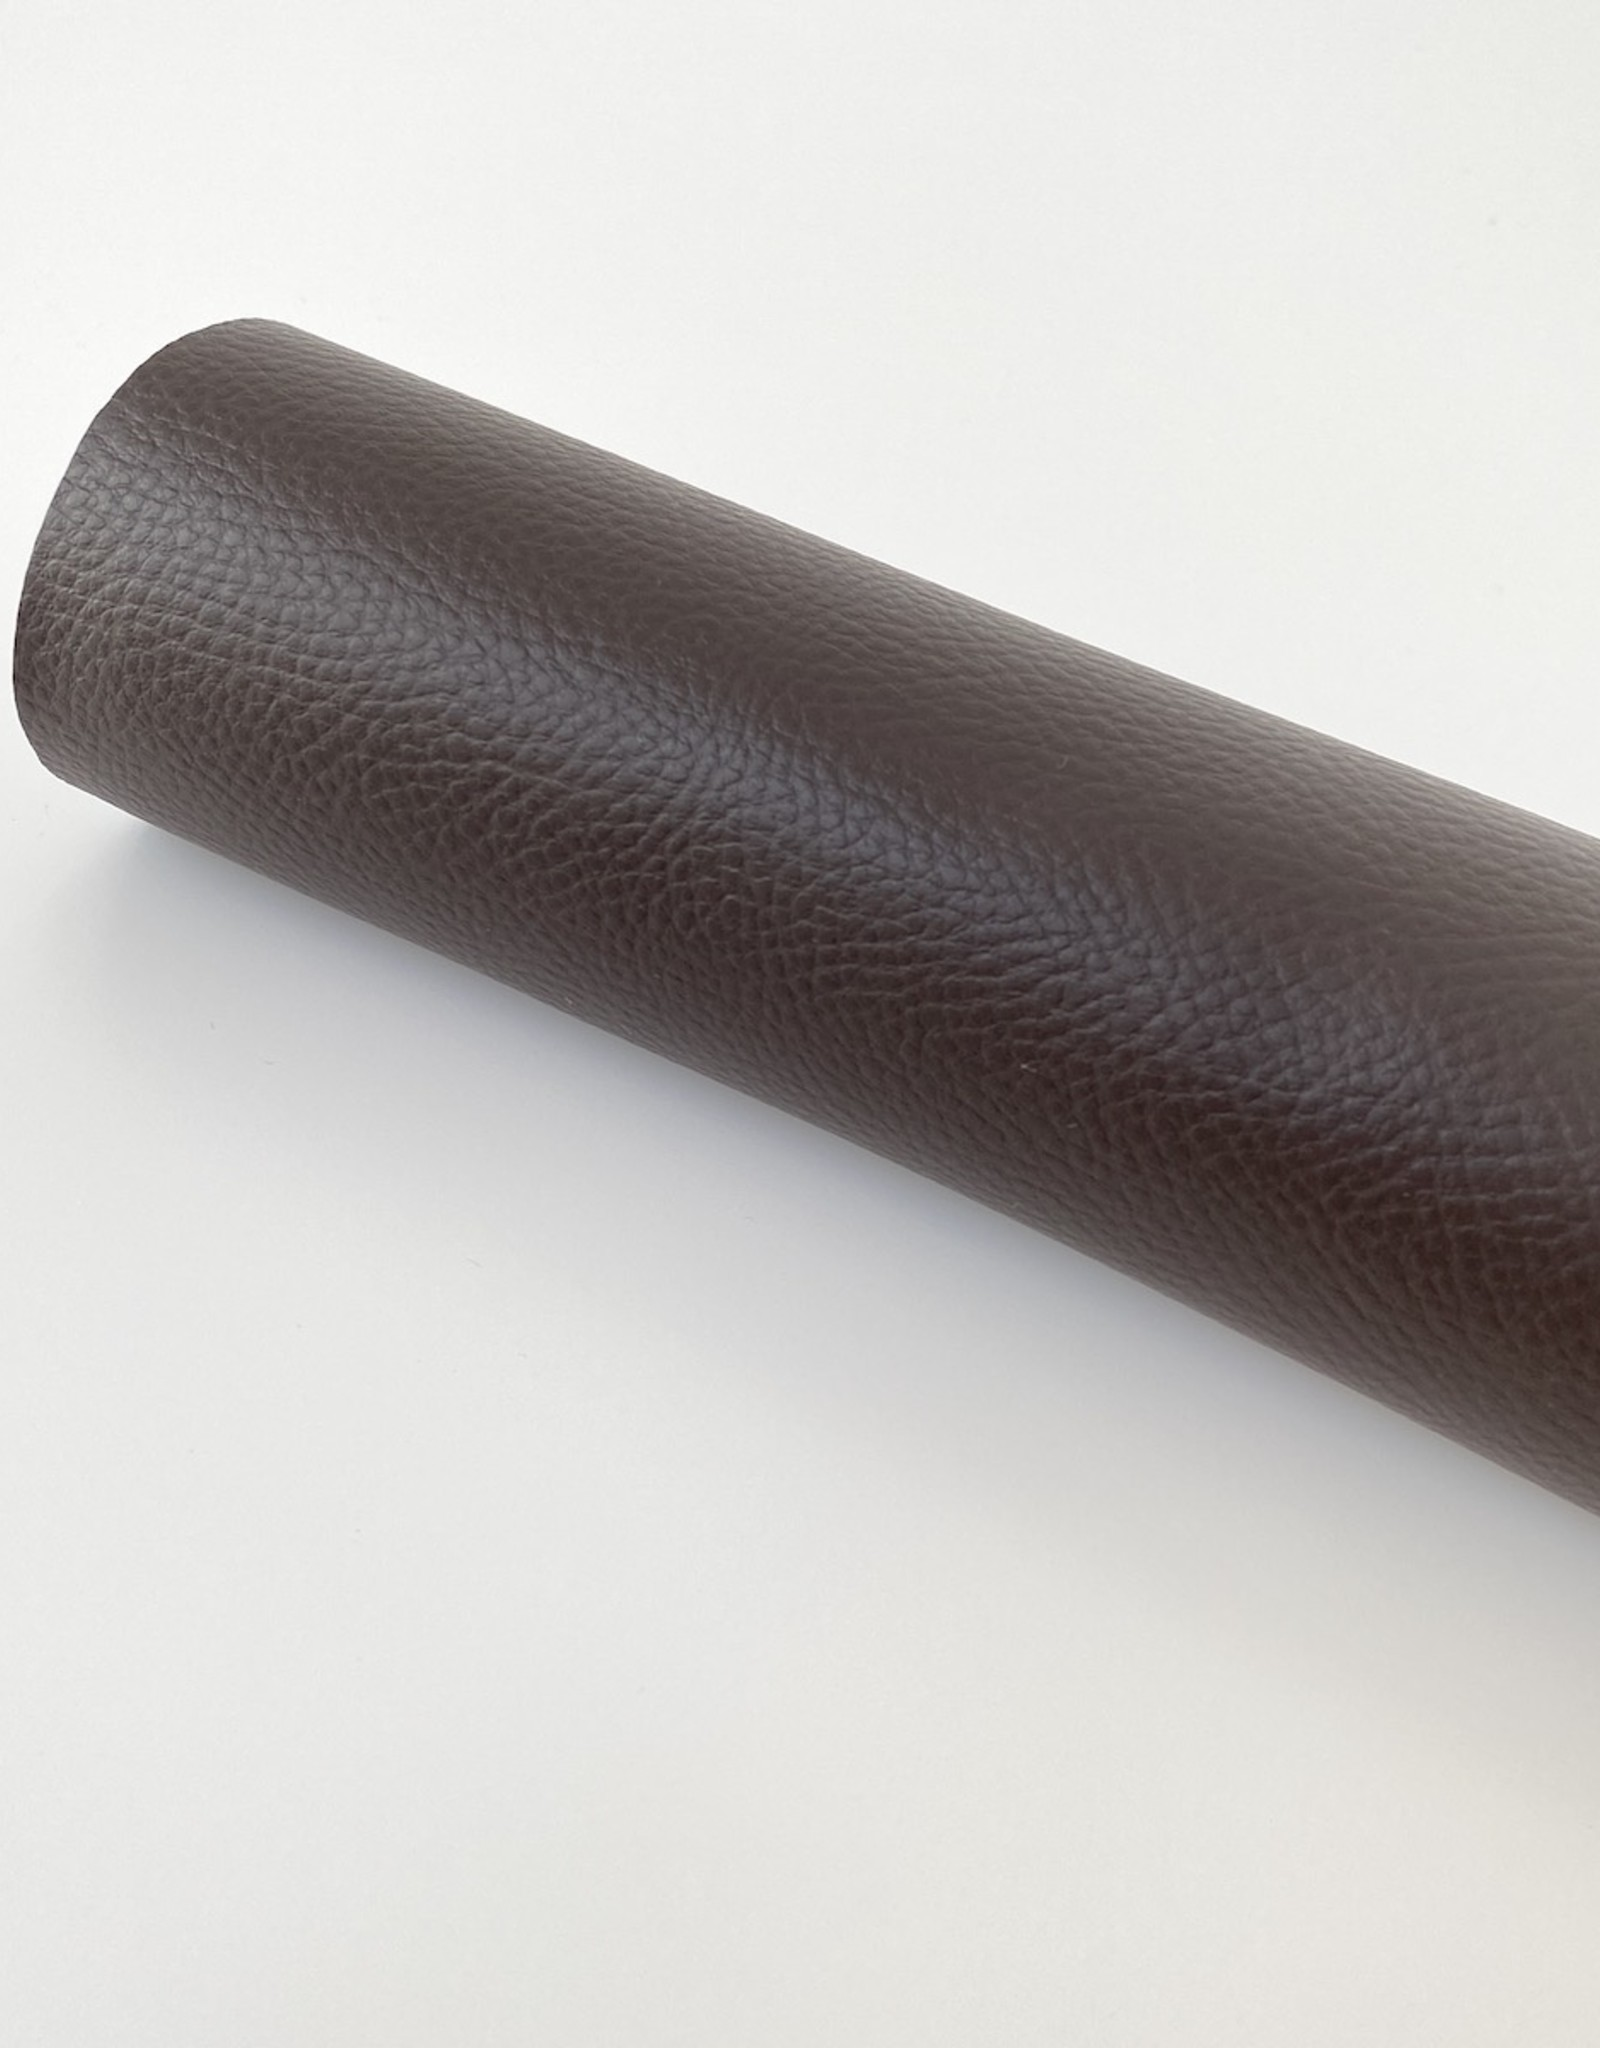 Kunstleer - op rol - Chocolade